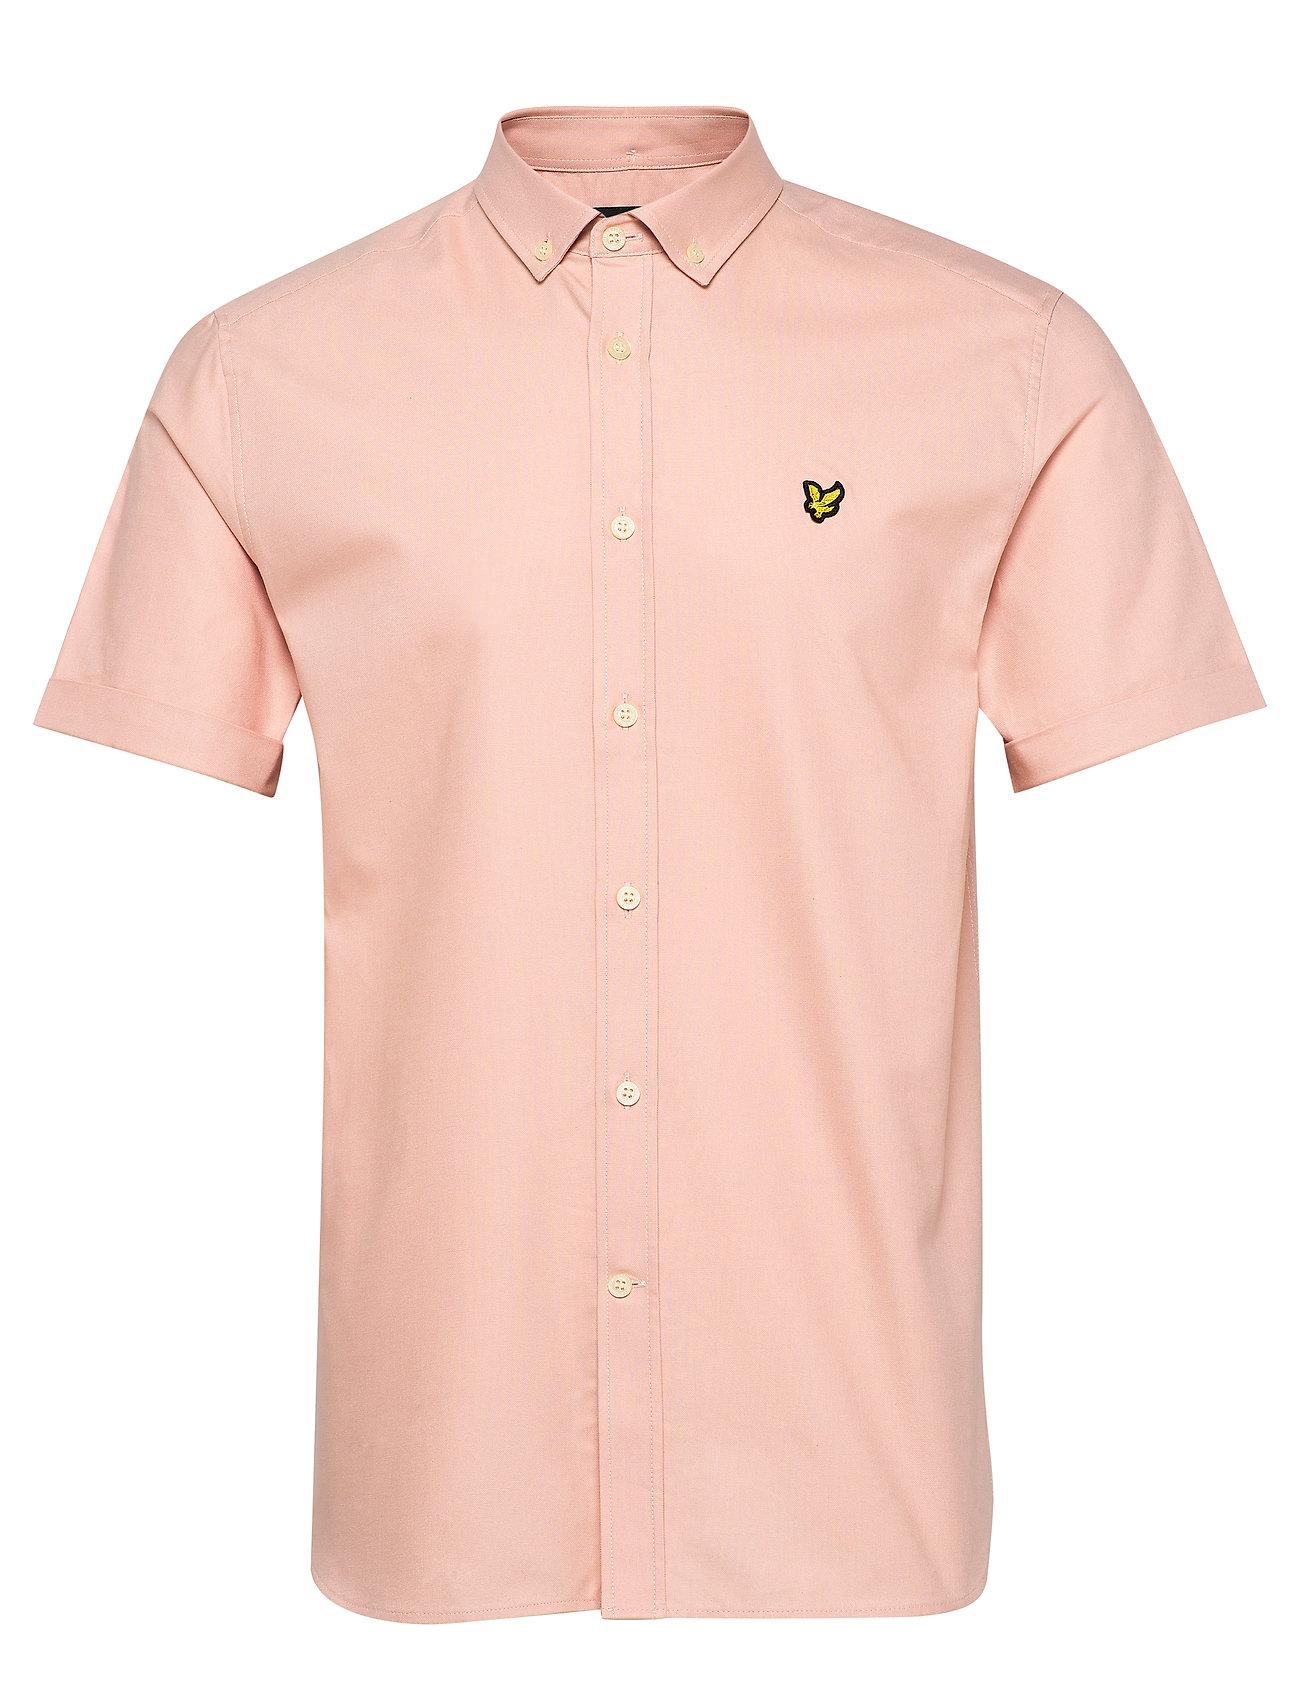 Lyle & Scott SS Oxford Shirt - DUSTY PINK